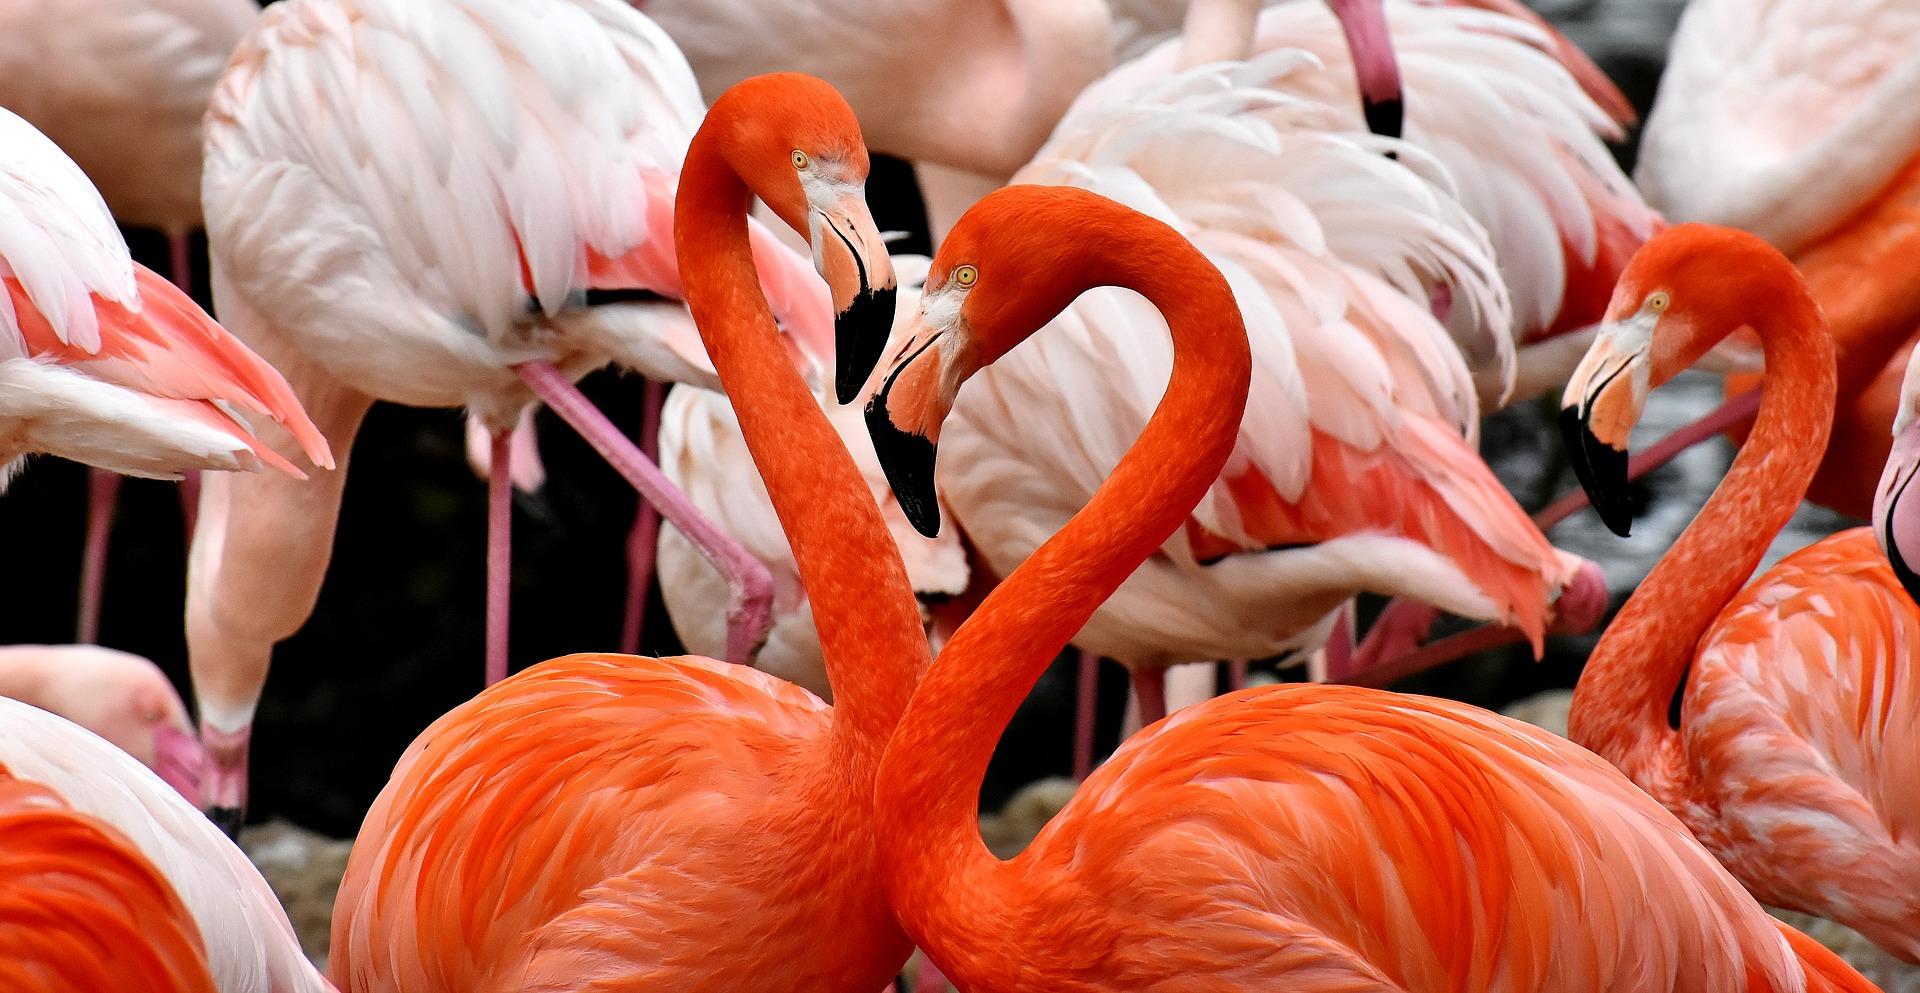 download wallpaper: flamingos wallpaper